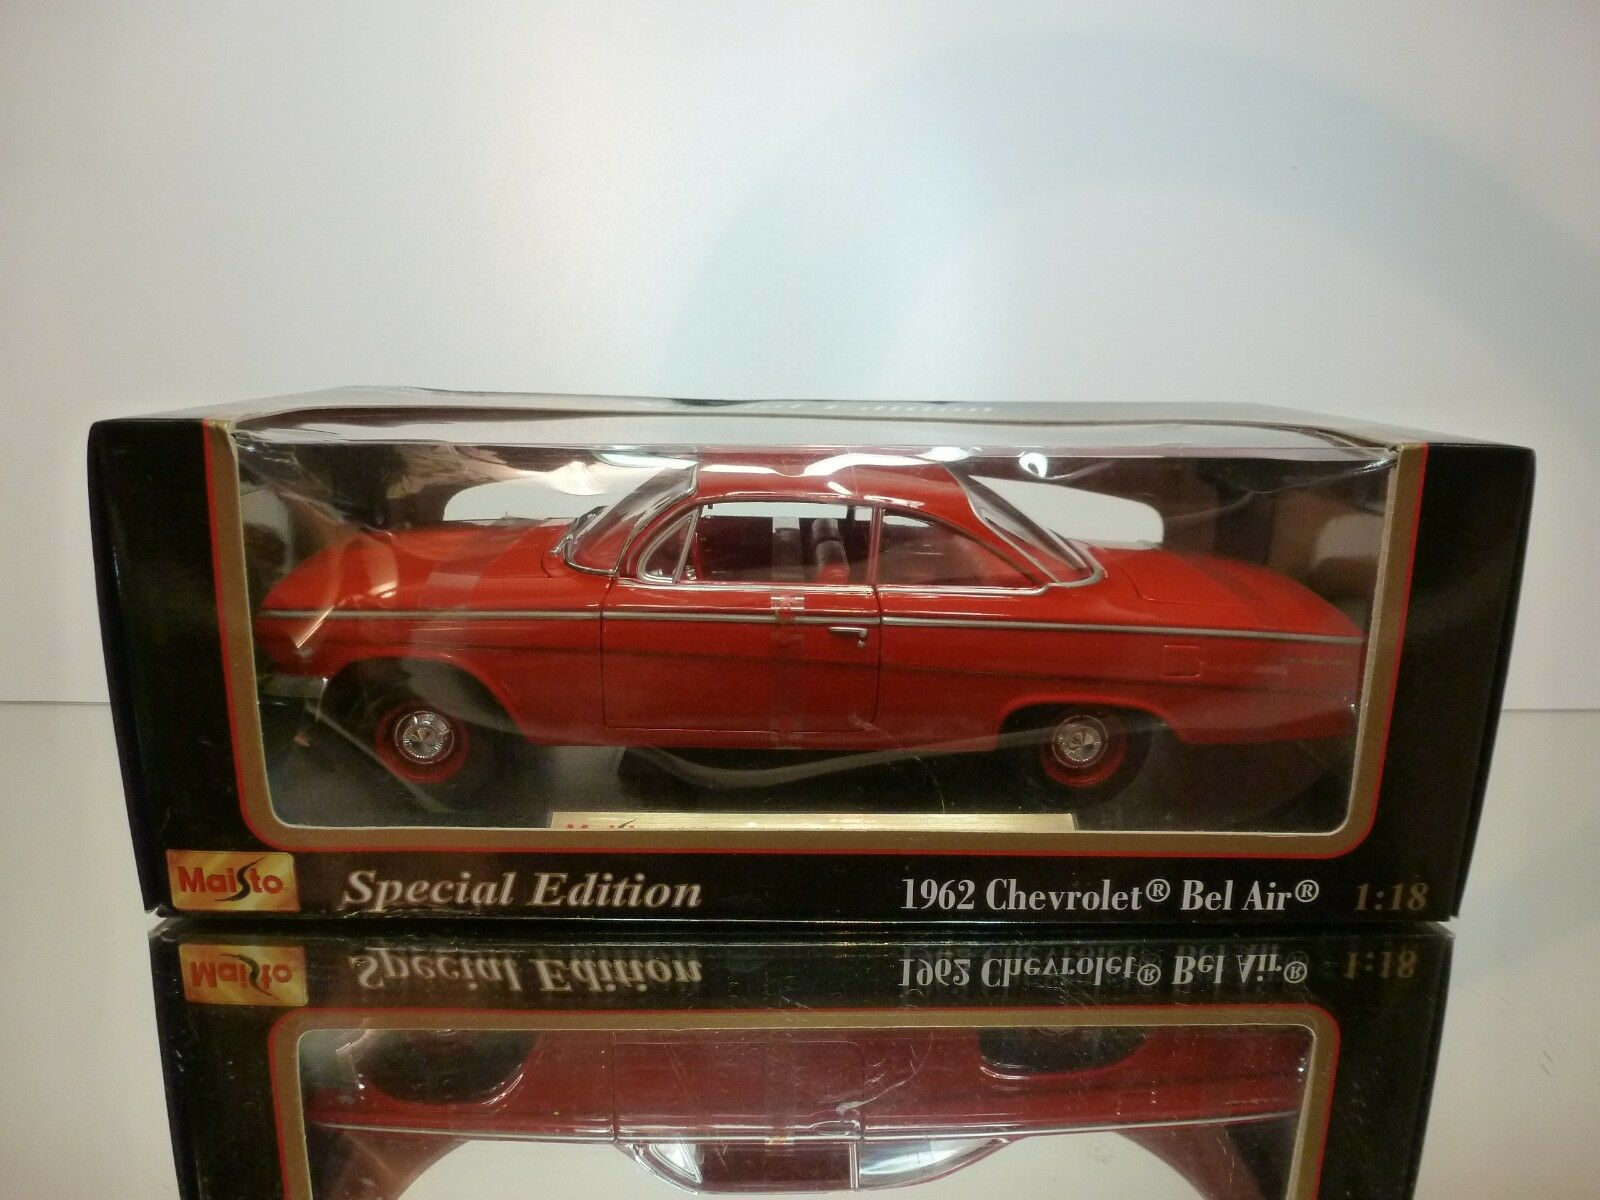 MAISTO 31641 CHEVROLET BEL AIR 1962  - RED 1 18 - VERY GOOD IN BOX